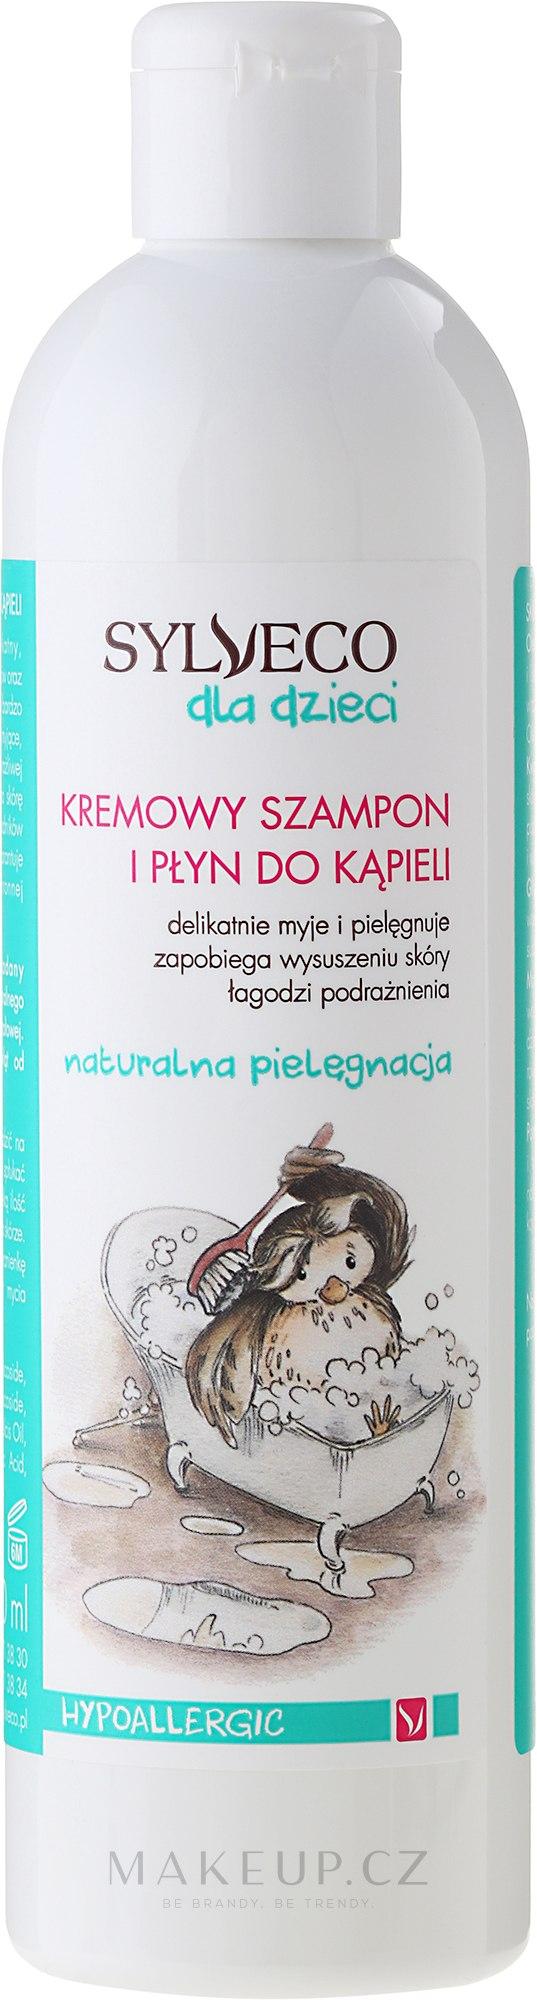 Šampon-pěna pro děti - Sylveco — foto 300 ml